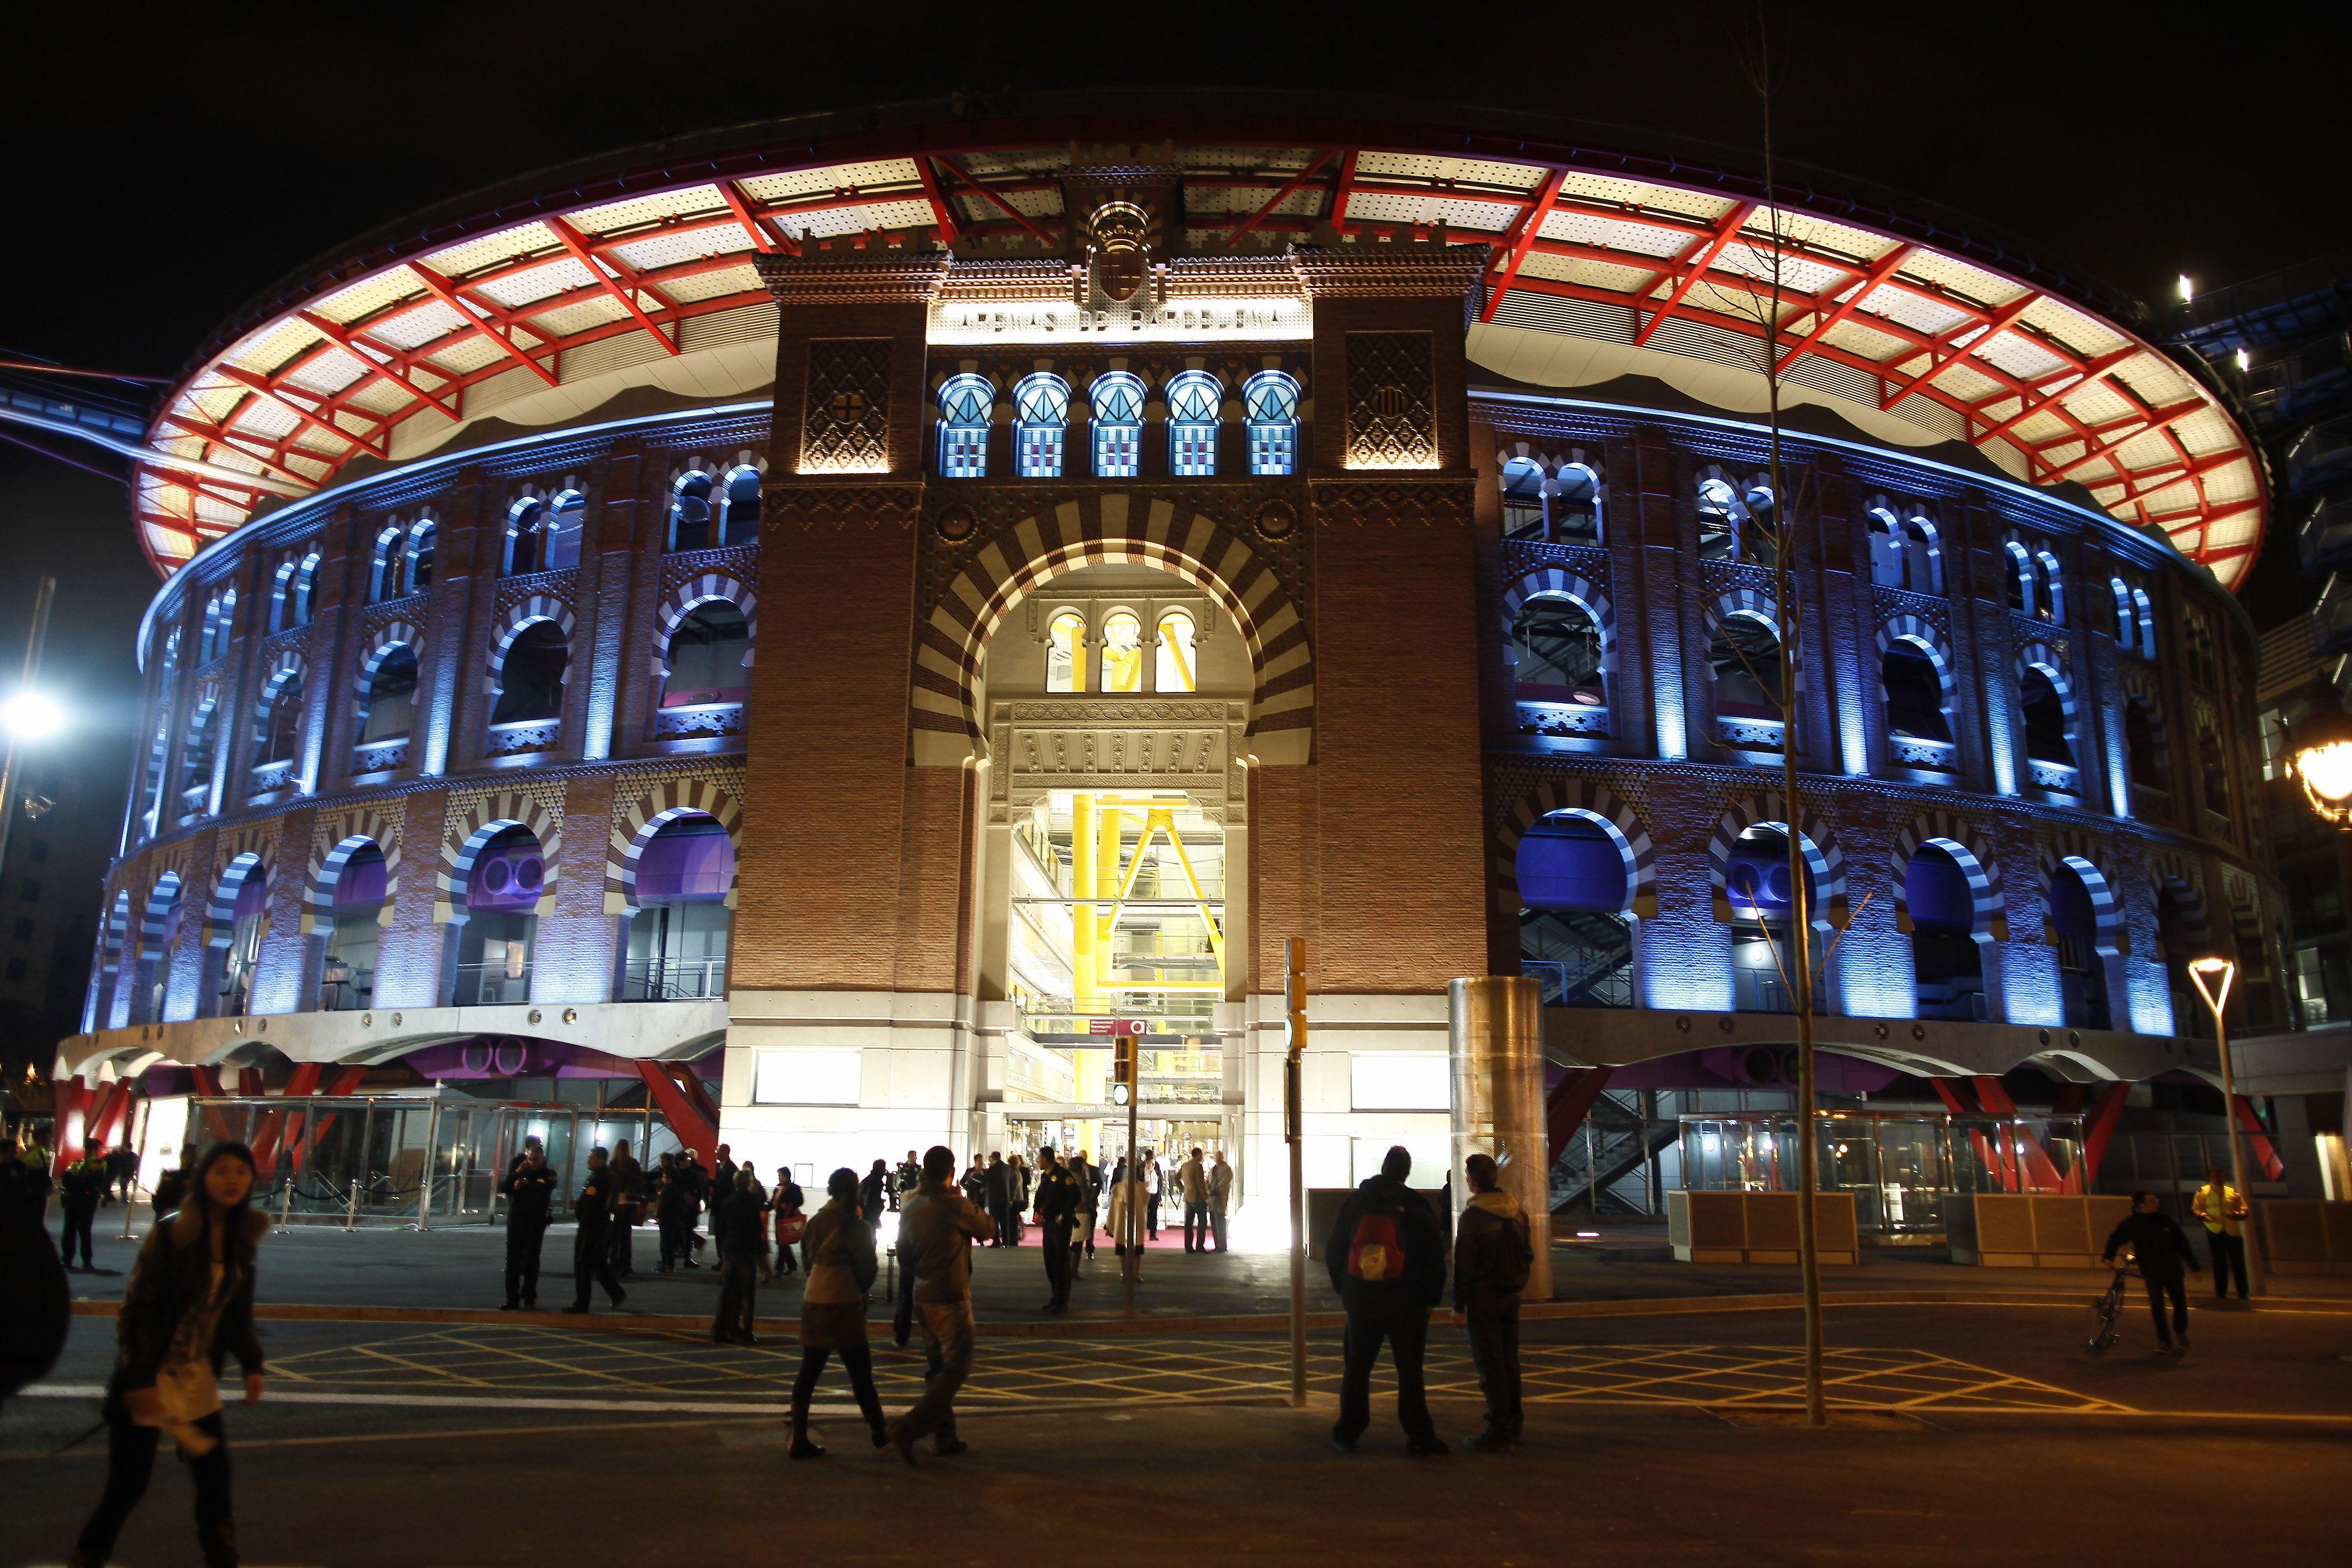 Las Arenas An Avant Garde Space That Combines Business Leisure And Cultural Components Arenas Brings Past Las Arenas Barcelona Barcelona Espana Barcelona